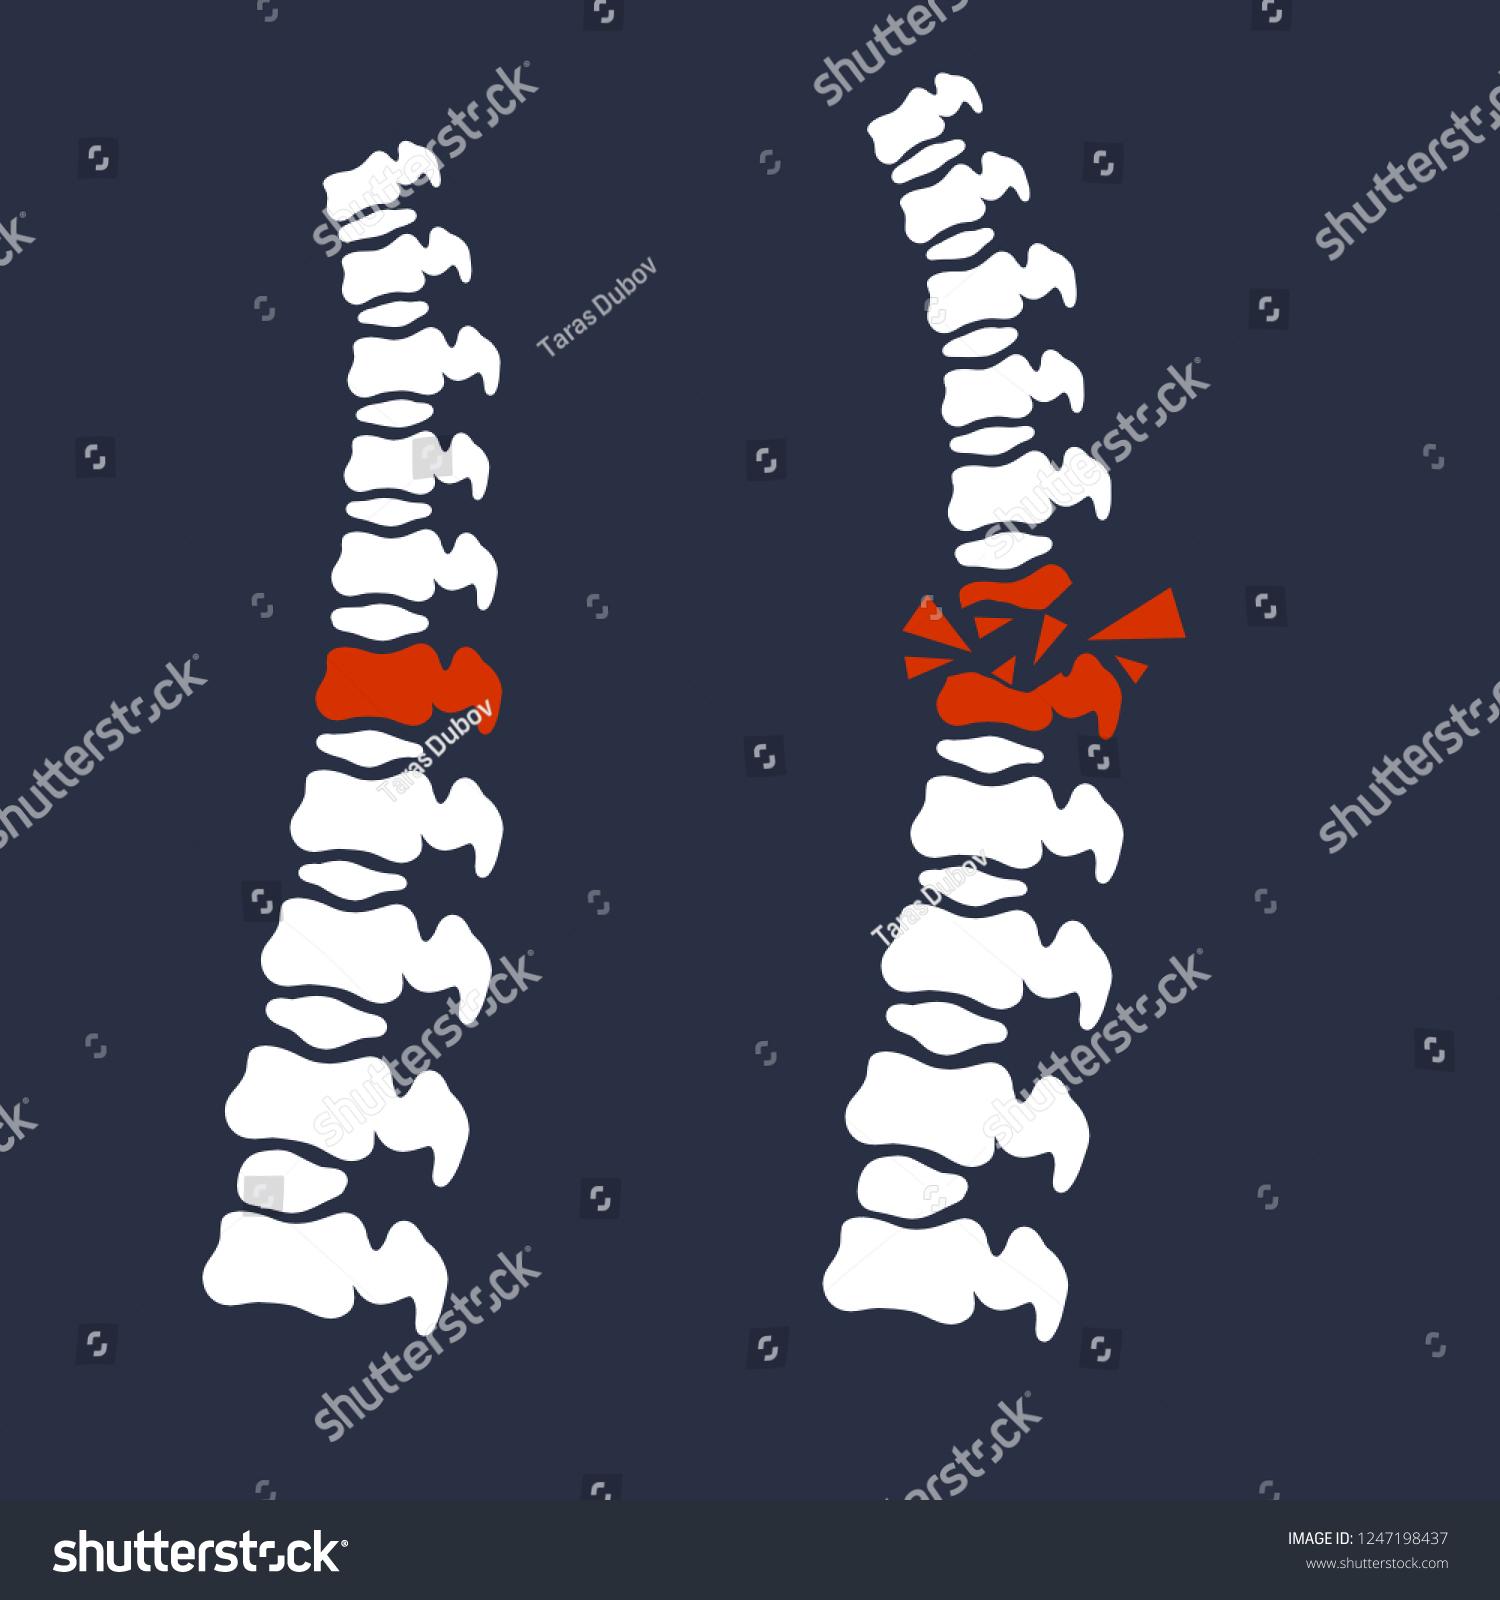 hight resolution of broken back diagram wiring diagram tutorial bones spine problem posture broken back stock vector royalty